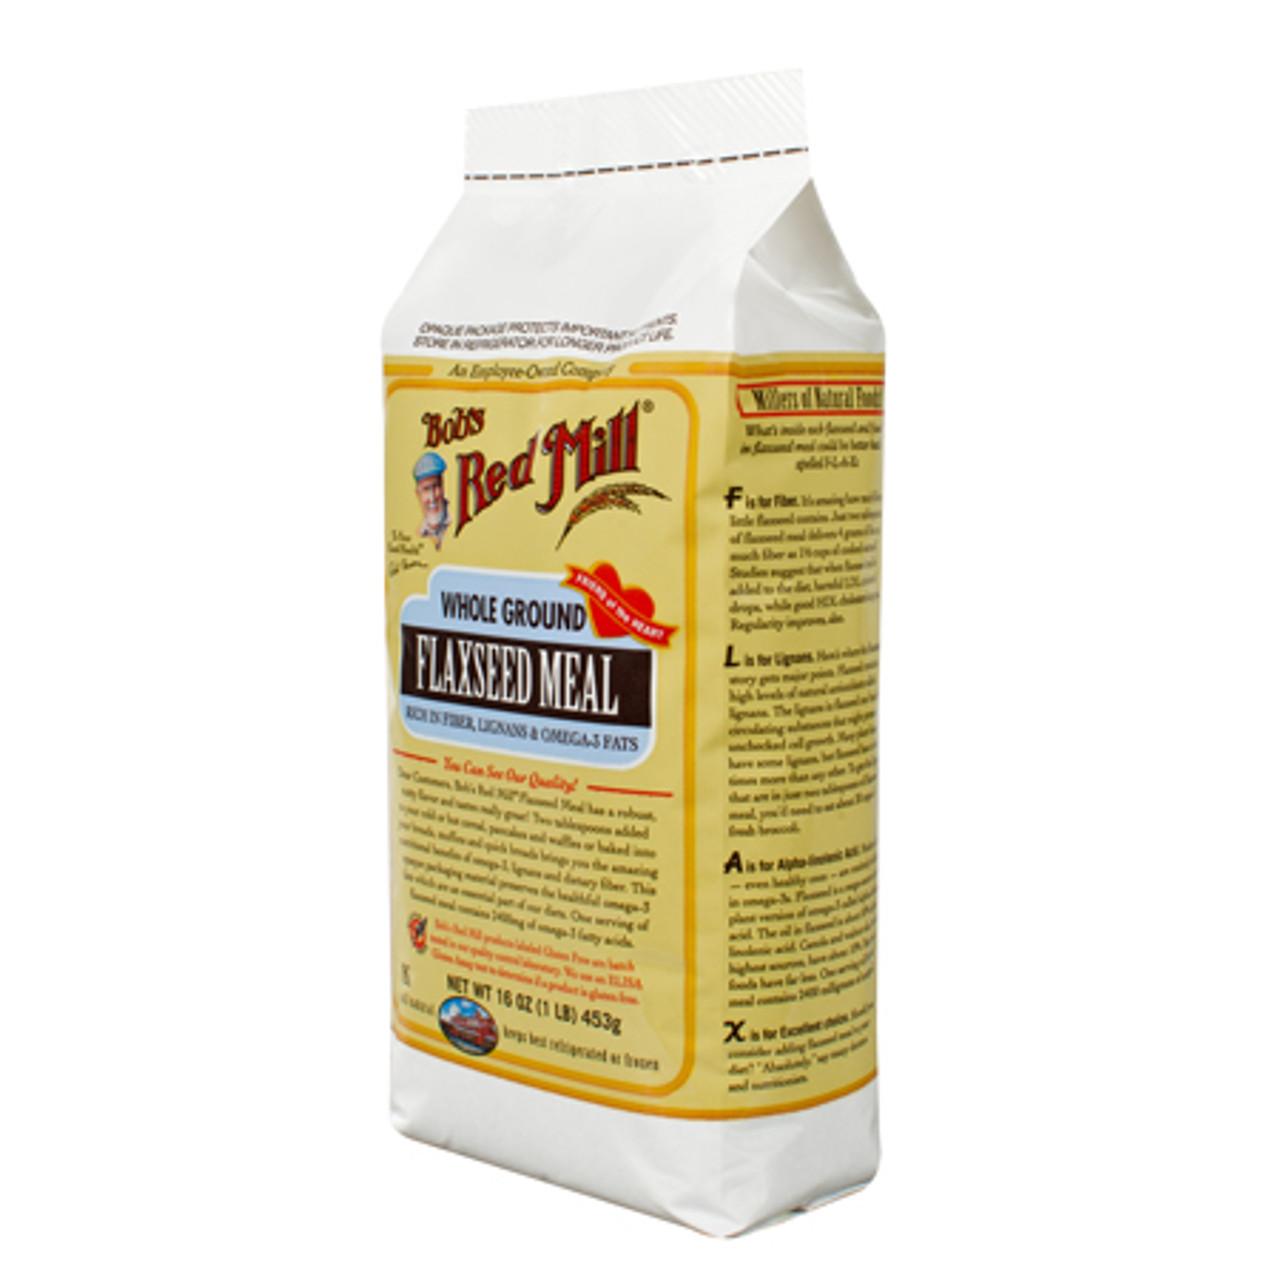 flaxseed meal